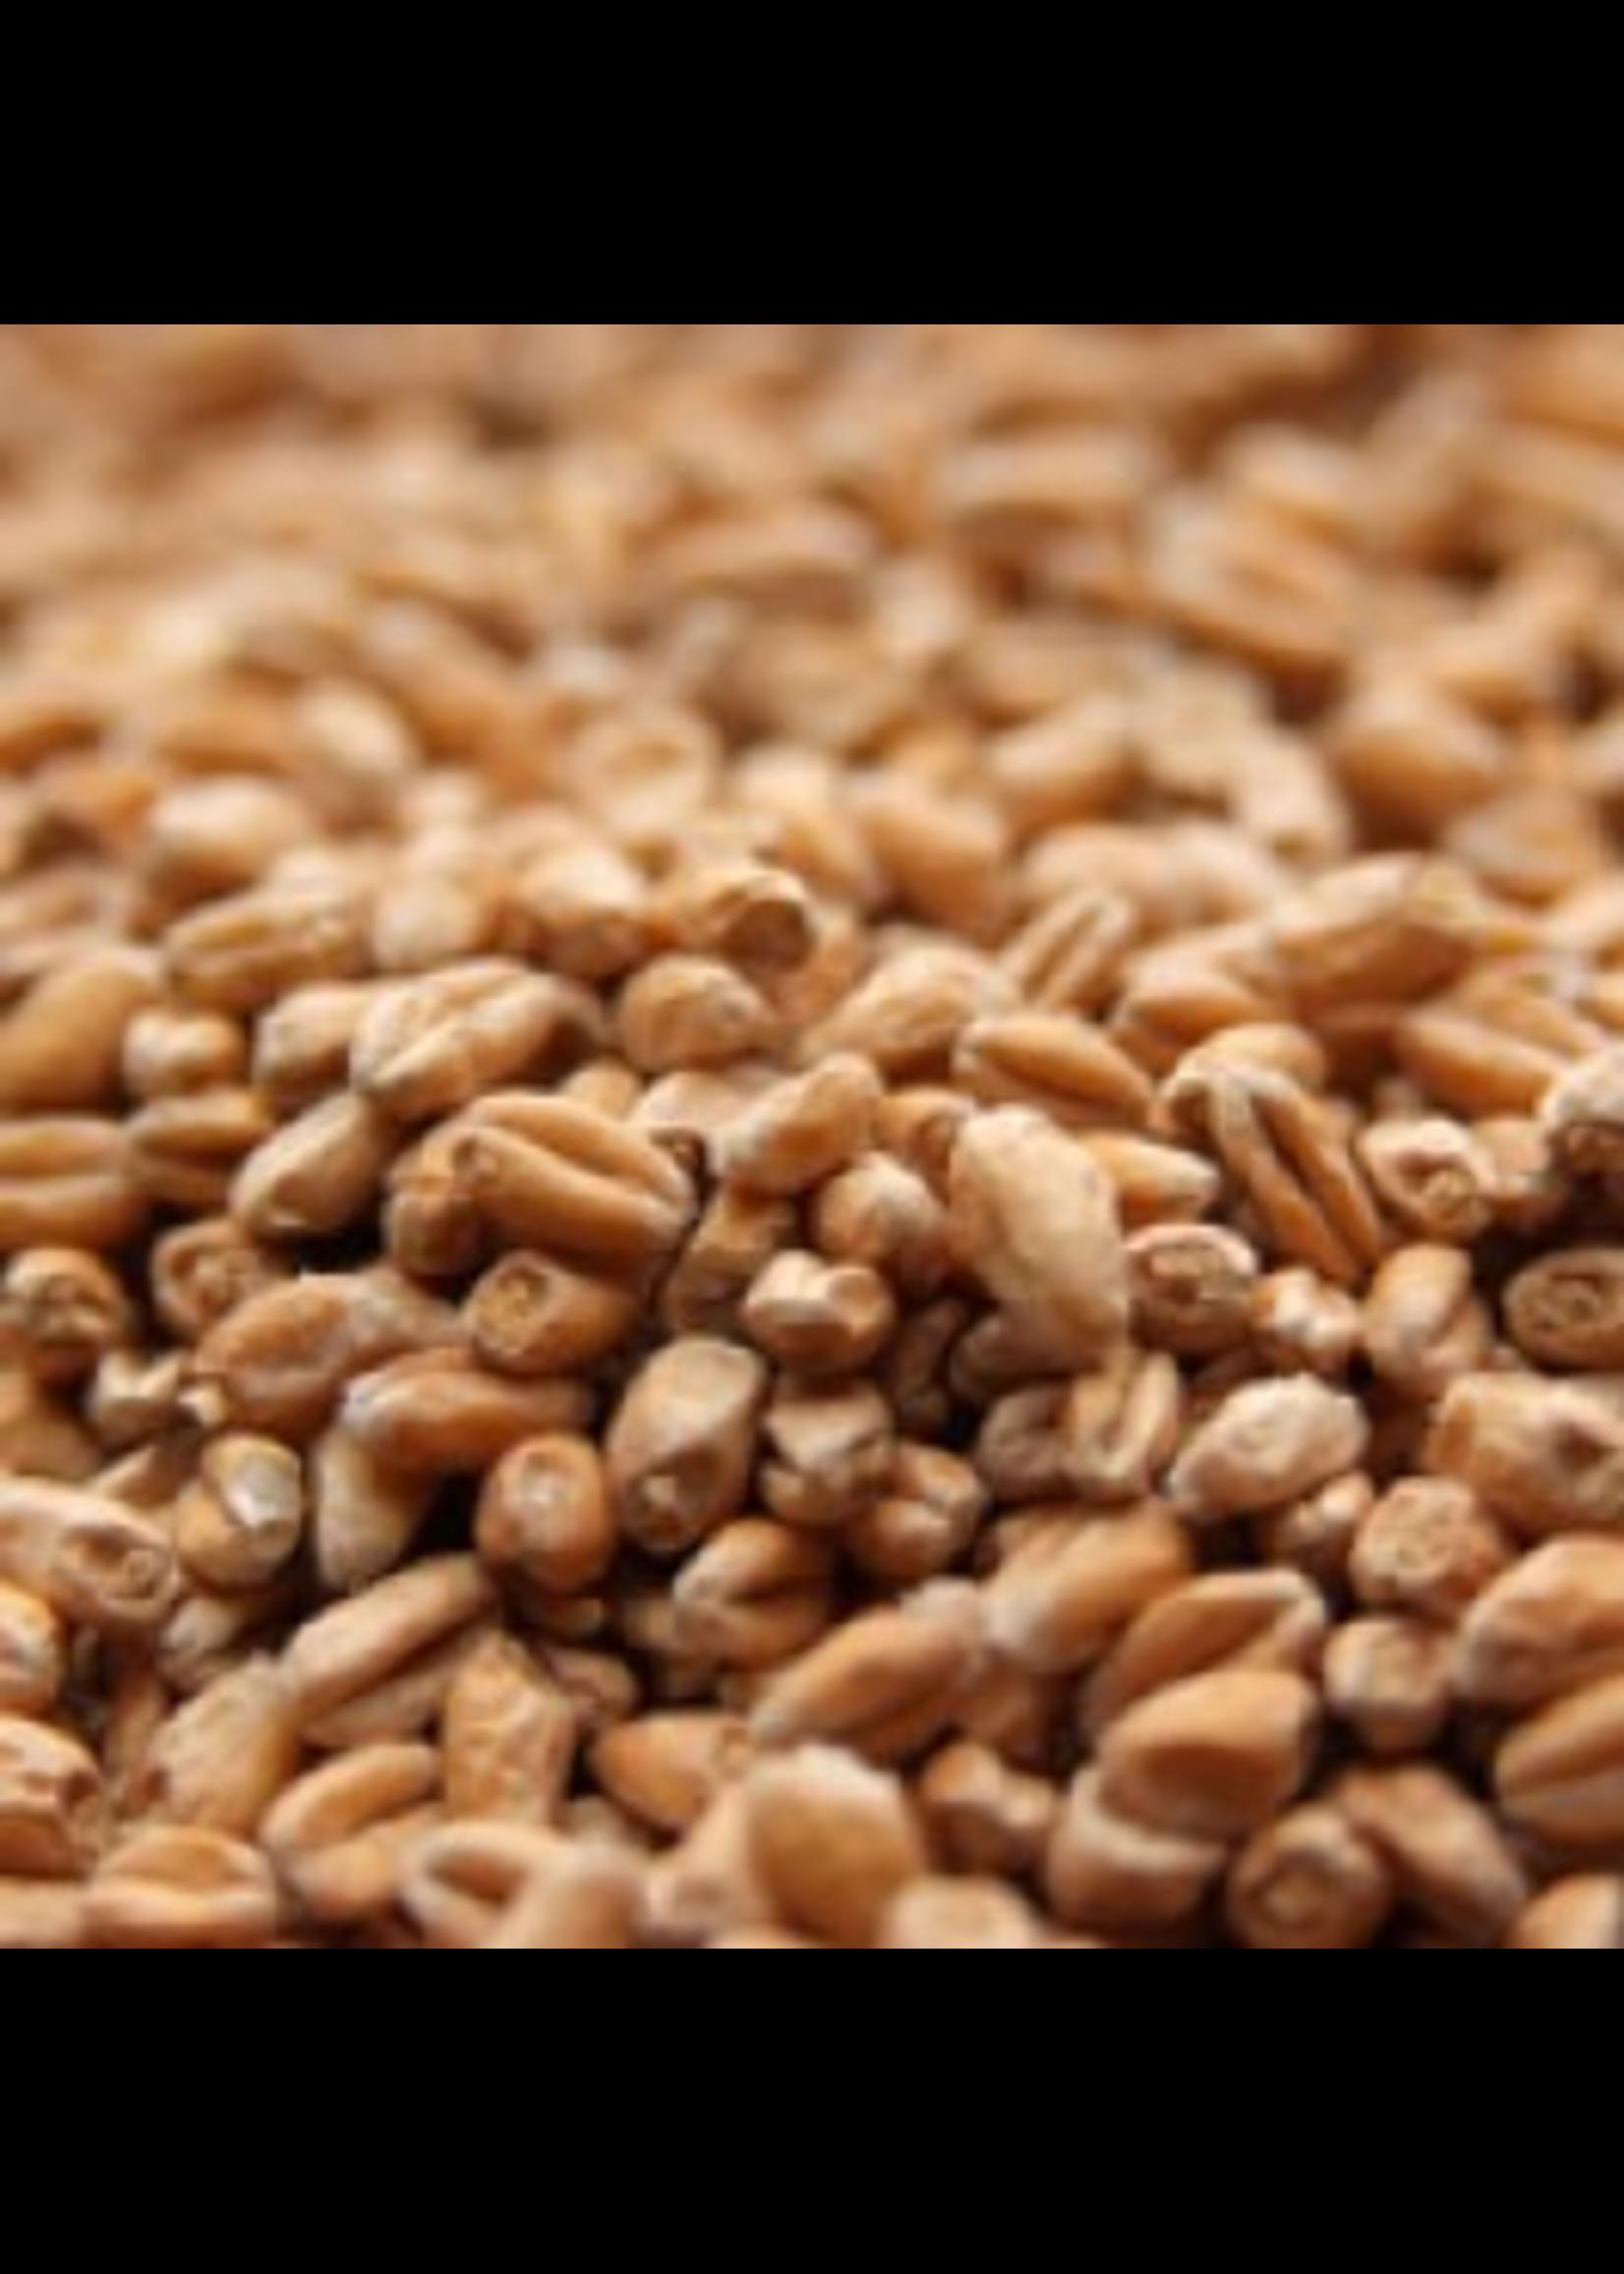 Grain Avangard Malz Premium Wheat Malt - A4 - 1 LB